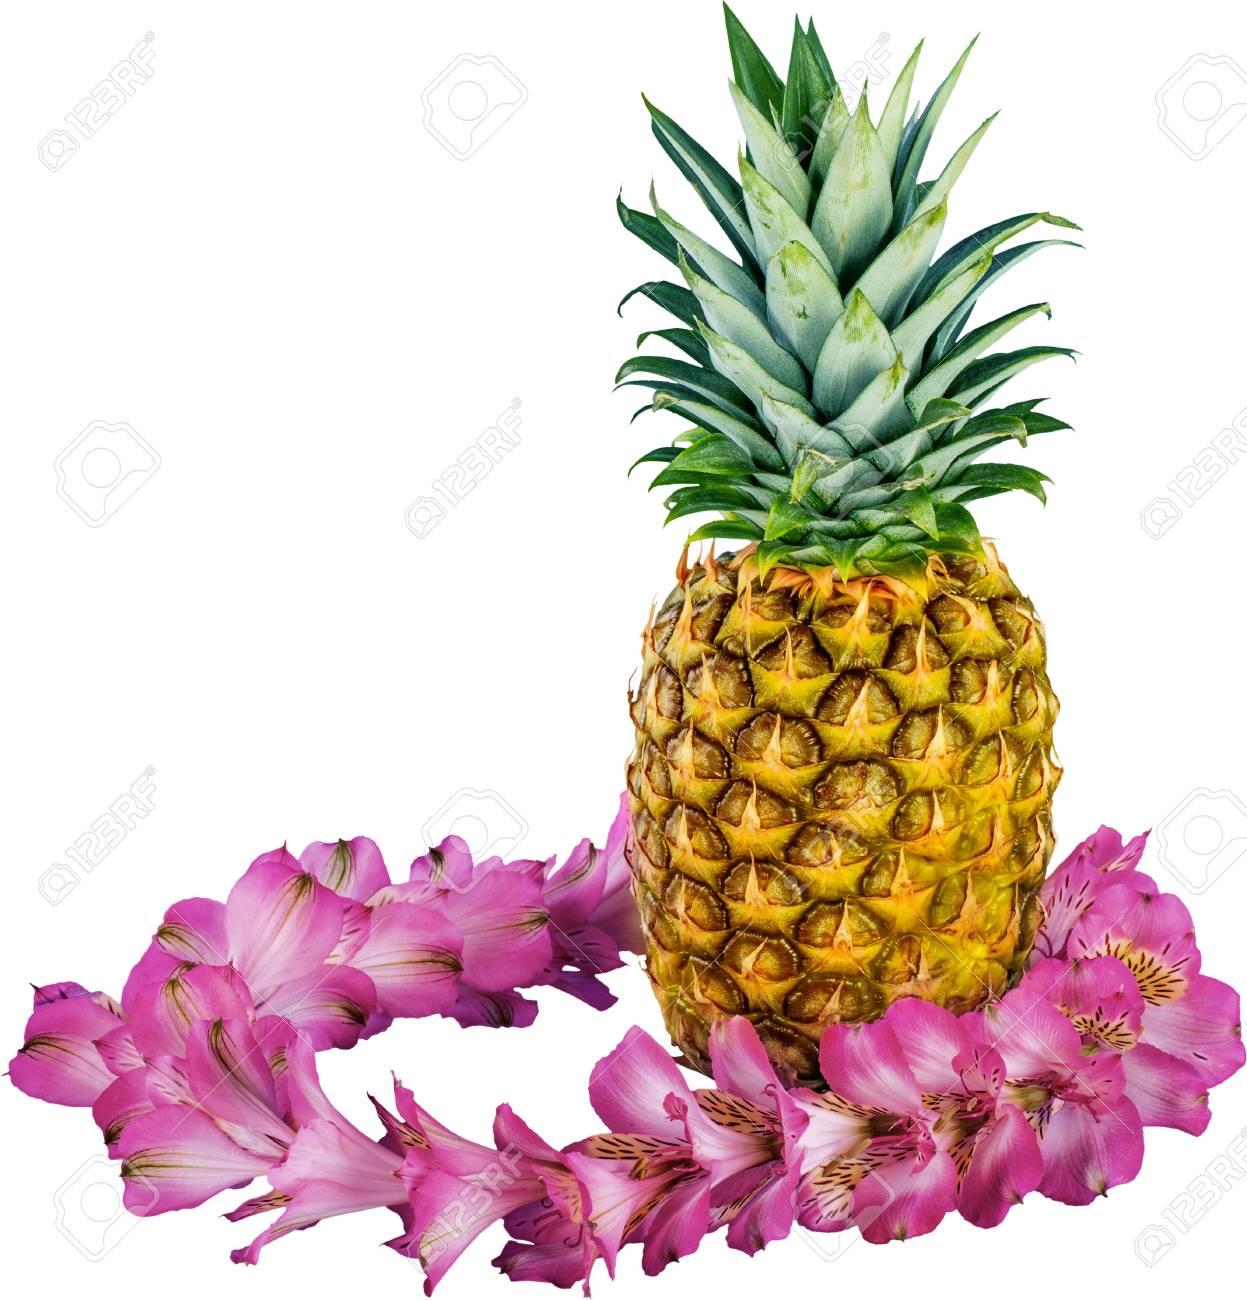 Hawaiian pineapple and fresh purple flower lei stock photo picture hawaiian pineapple and fresh purple flower lei stock photo 93376284 izmirmasajfo